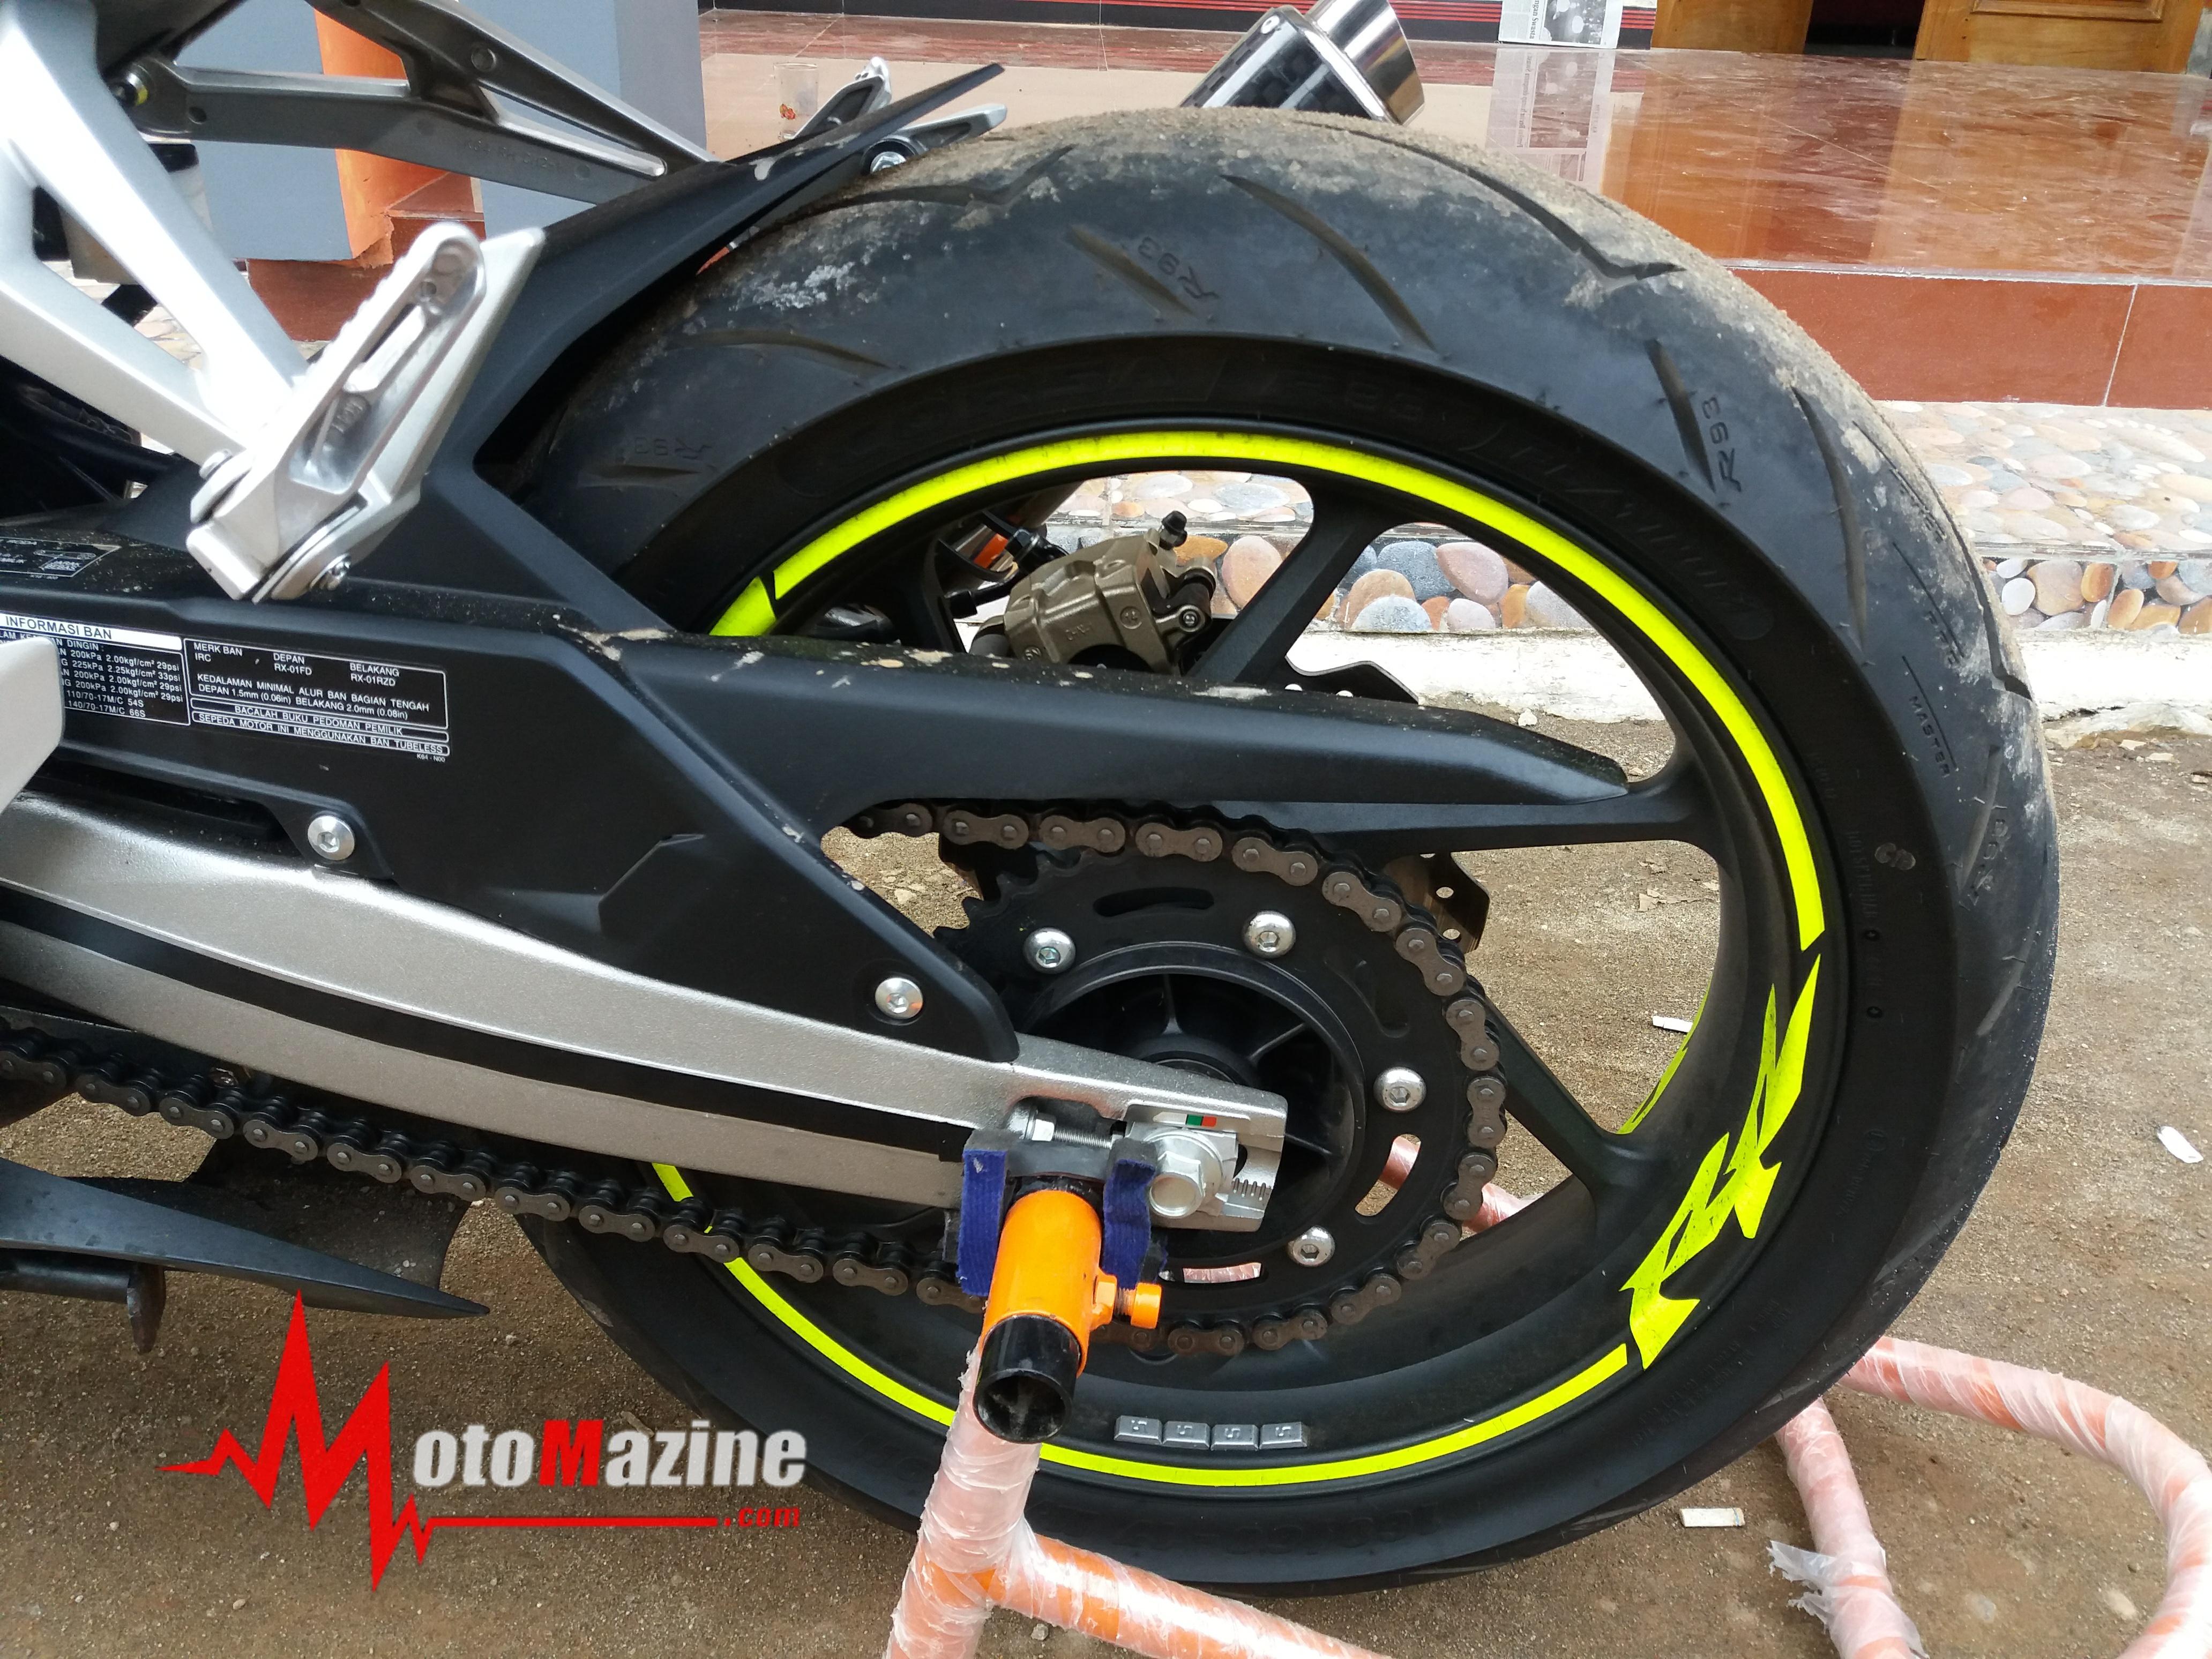 Modifikasi All New Honda CBR250RR Ala Yamaha M1 Rossi 2013